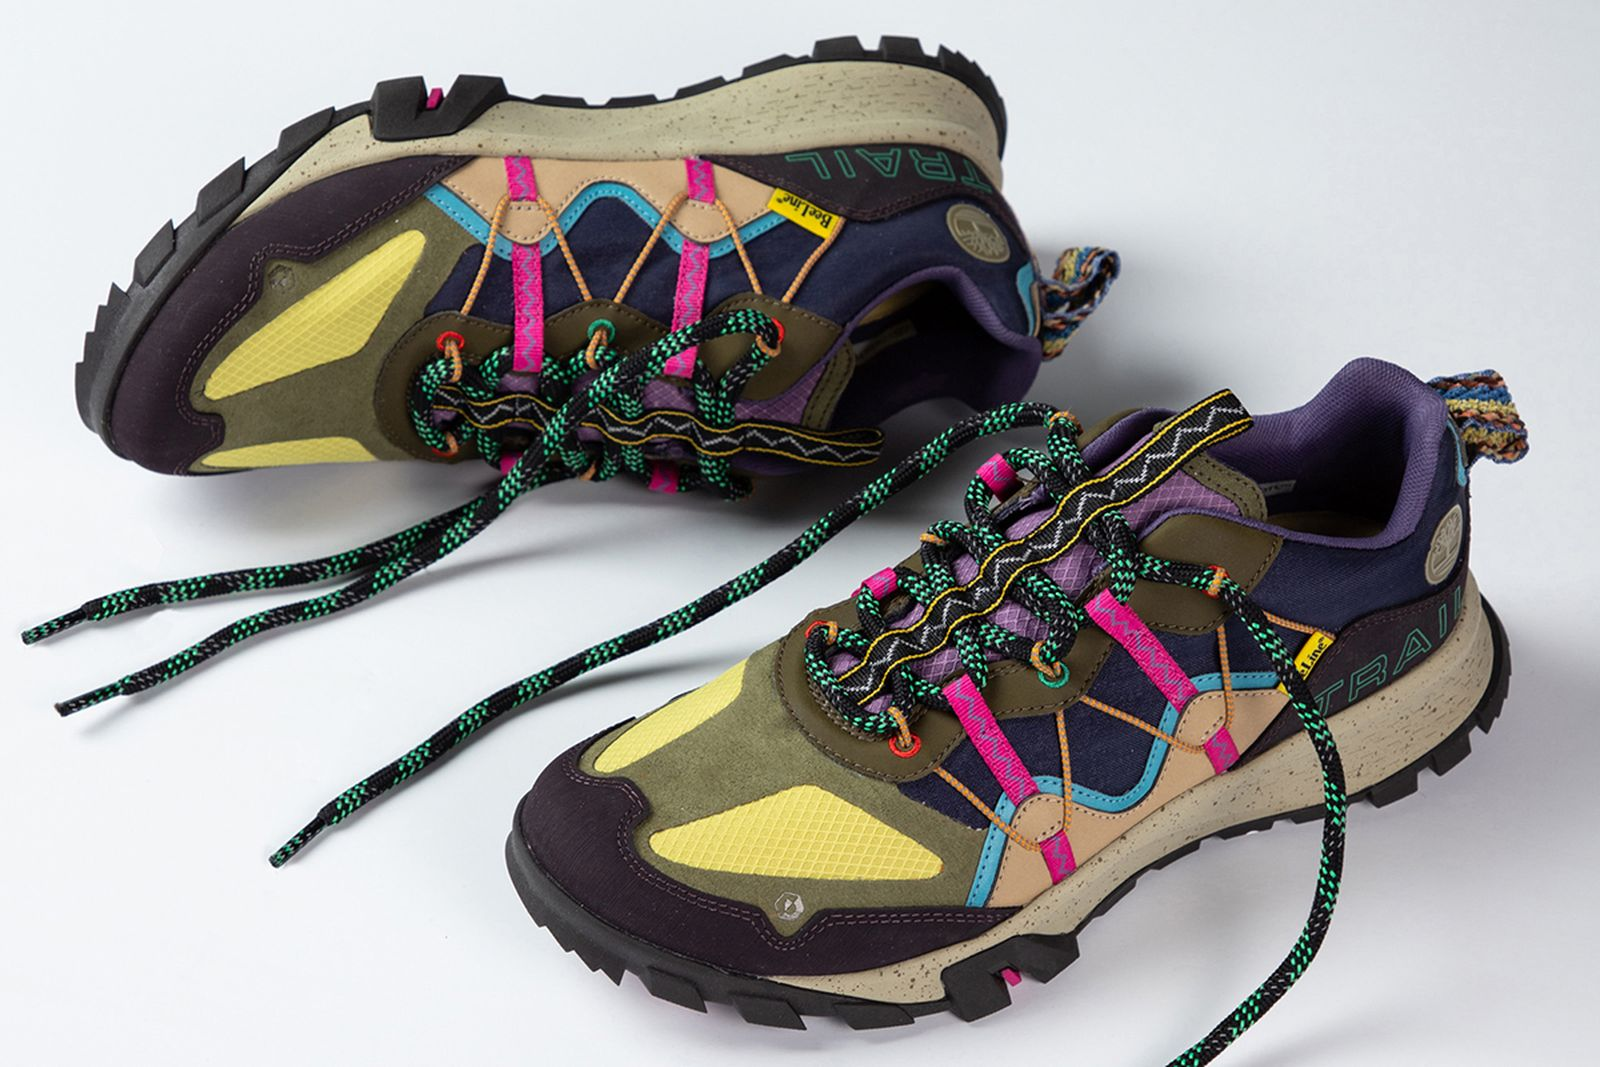 bee-line-timberland-hiking-capsule-release-info-00